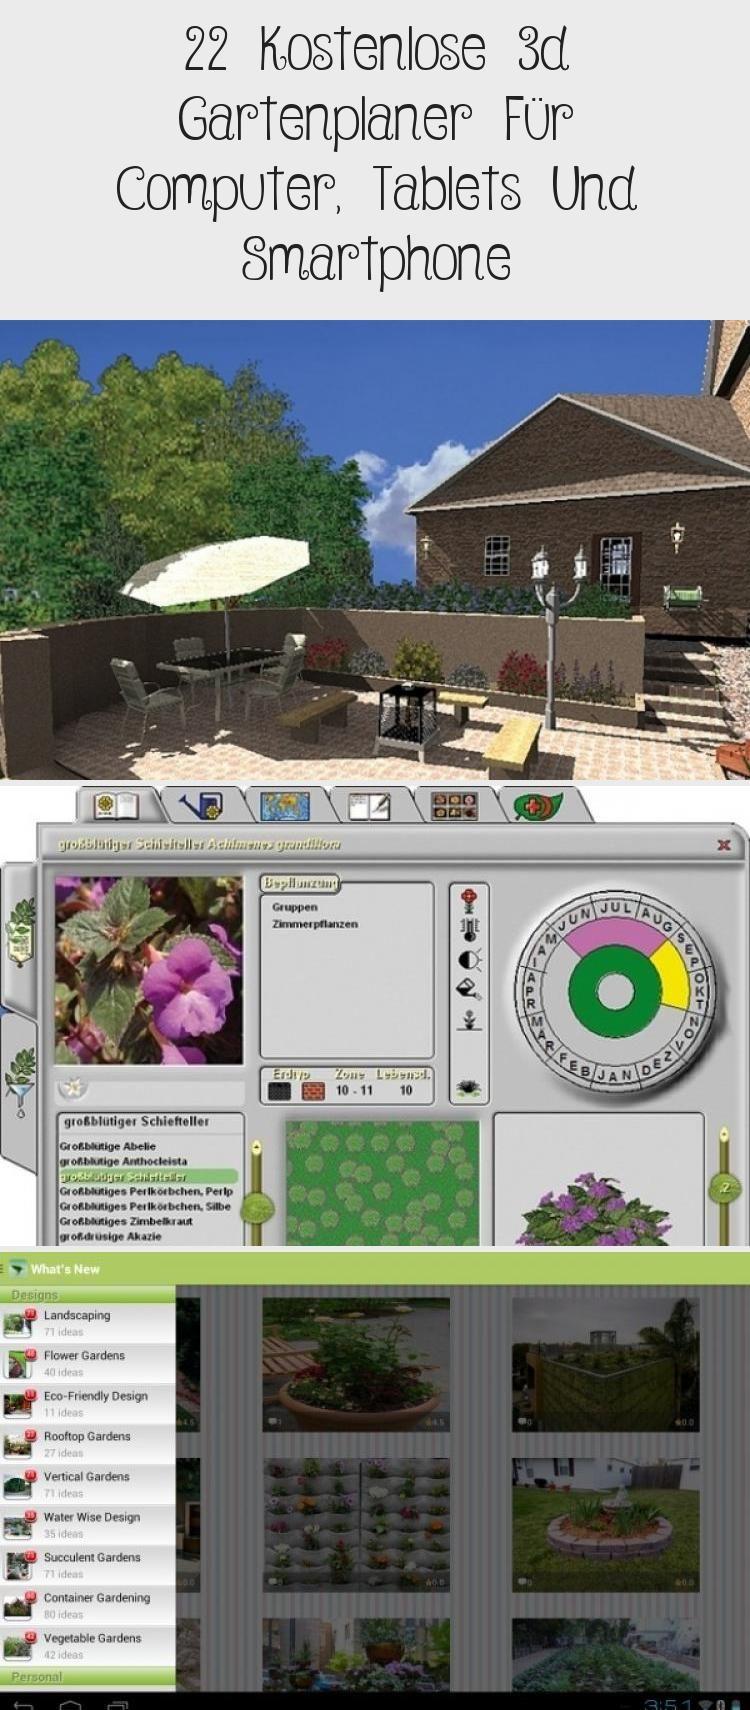 Planer Landschaftsbau Online Software Mein Schoener Garten Planungstool Gartenplanungskizze Gartenplanungideen Gartenplanunghang In 2020 With Images House Styles Mansions Decor